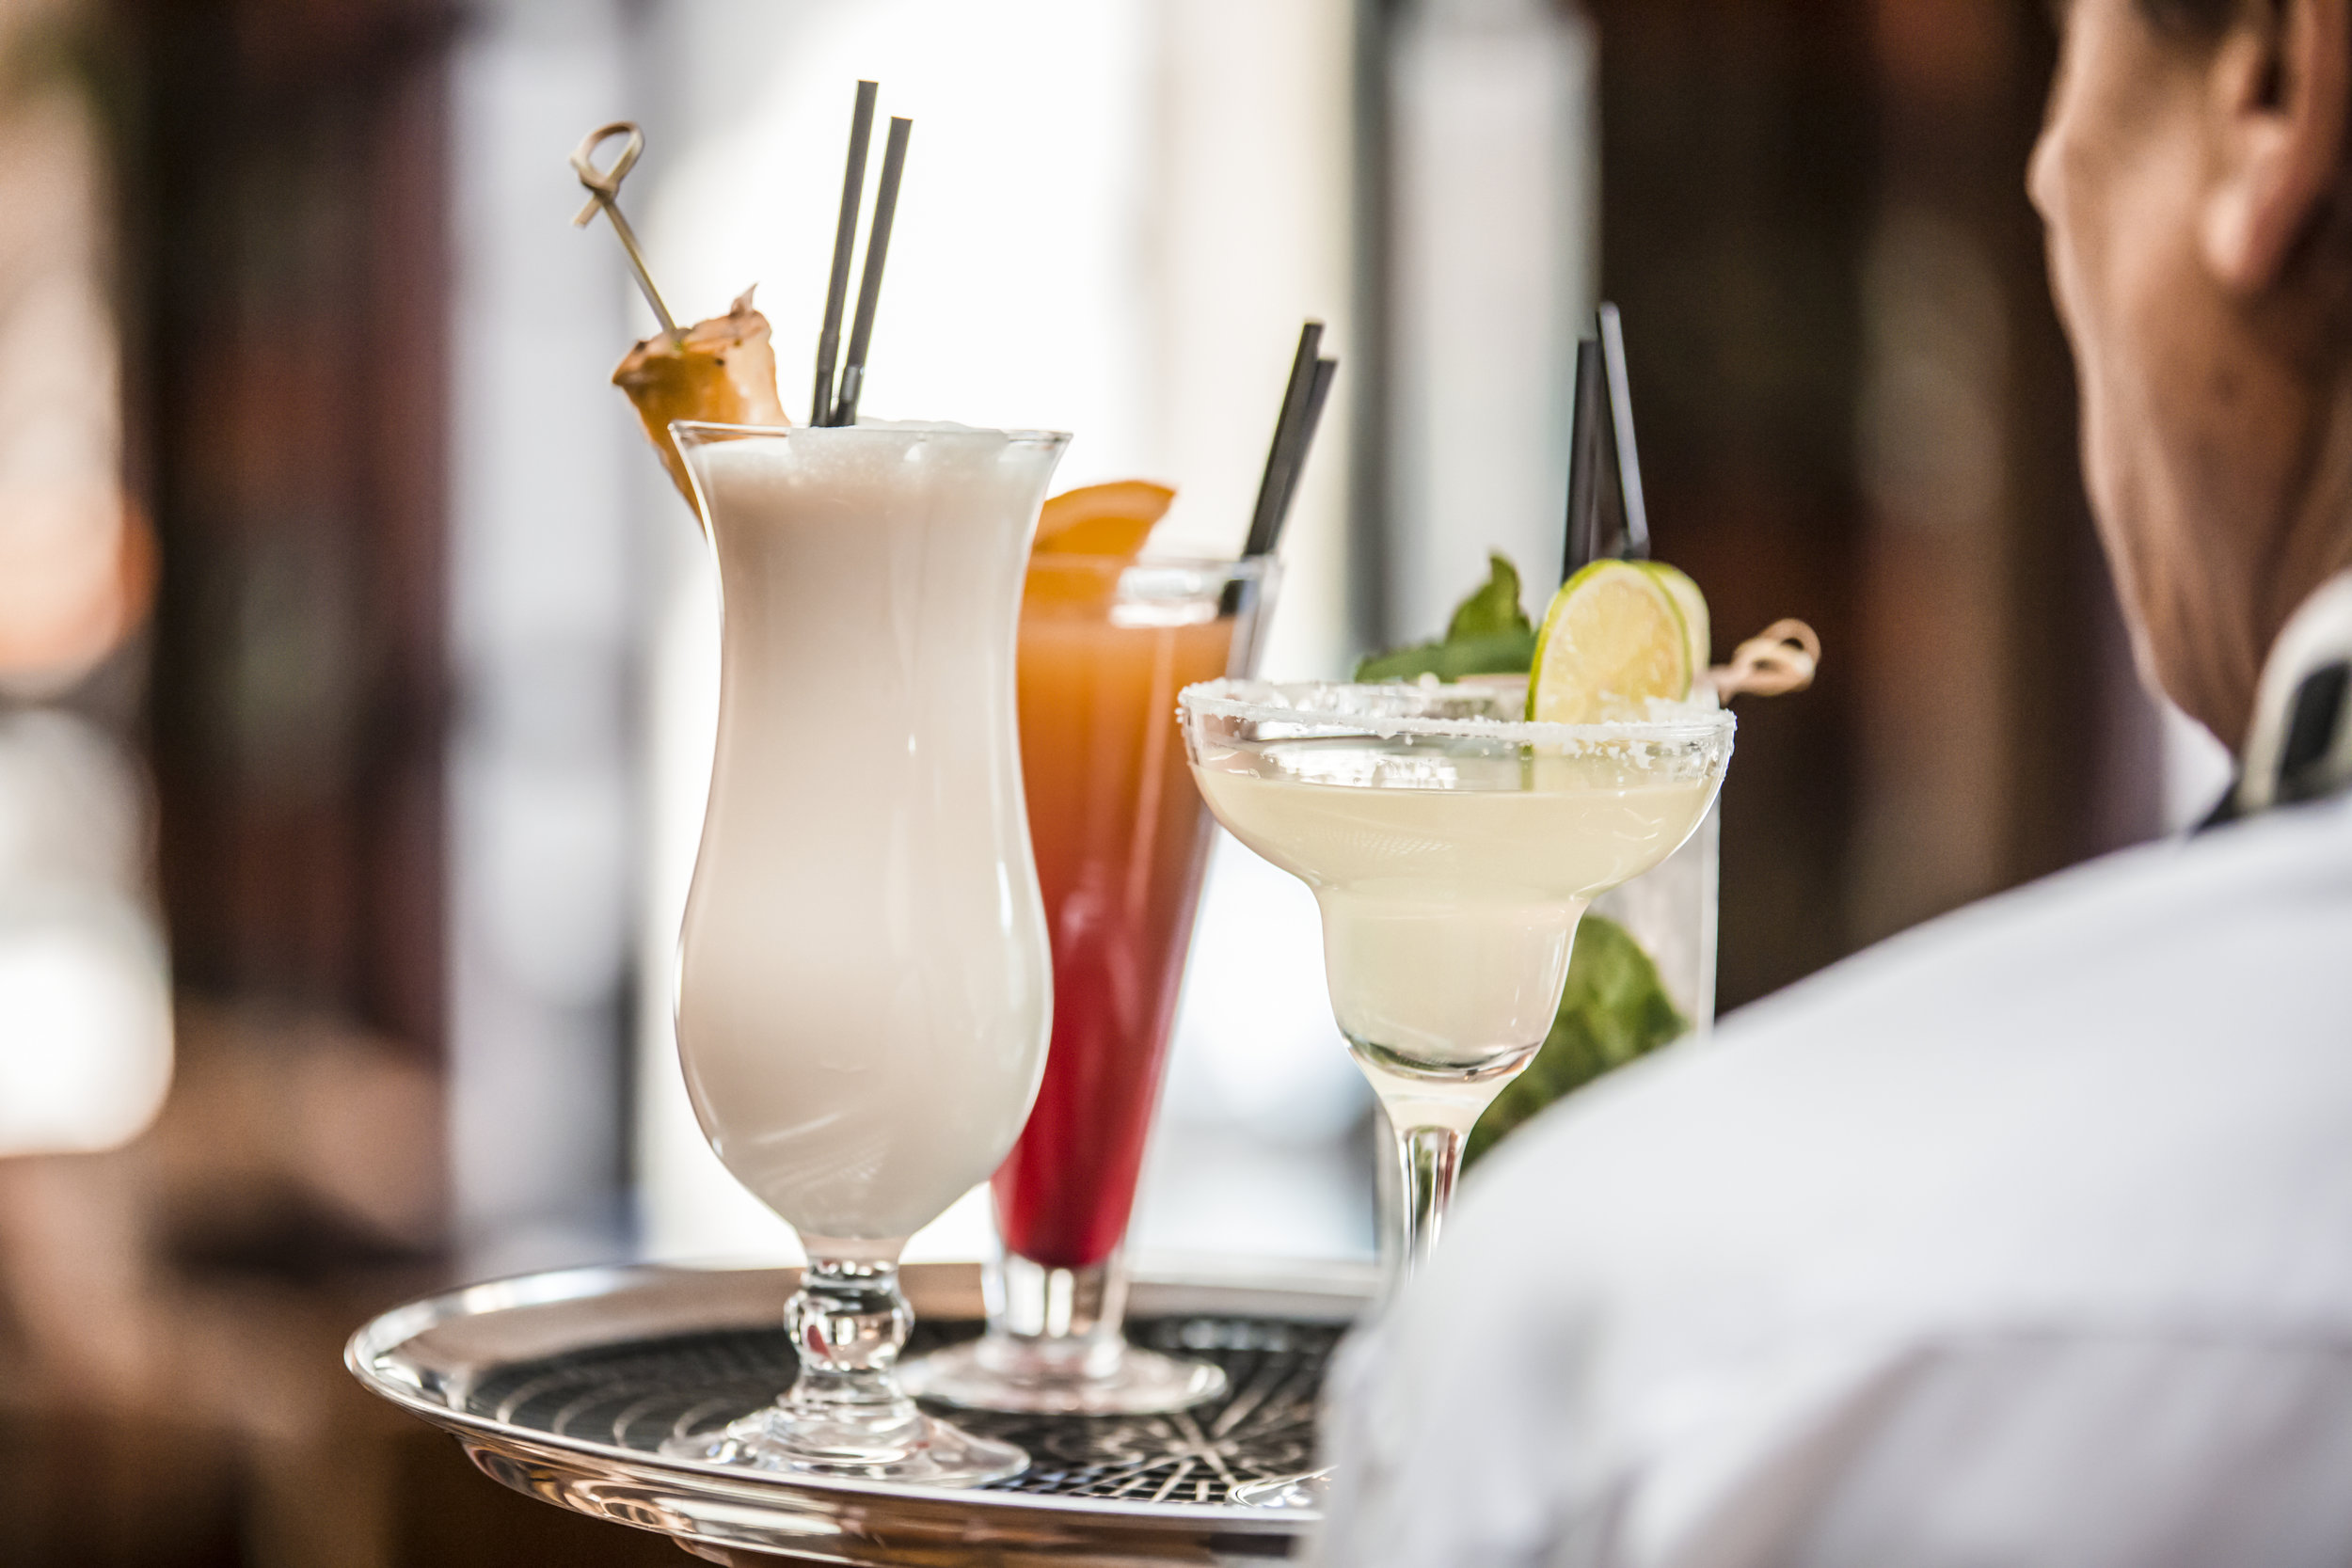 33028_Europa  Hotel - Cocktails.jpg